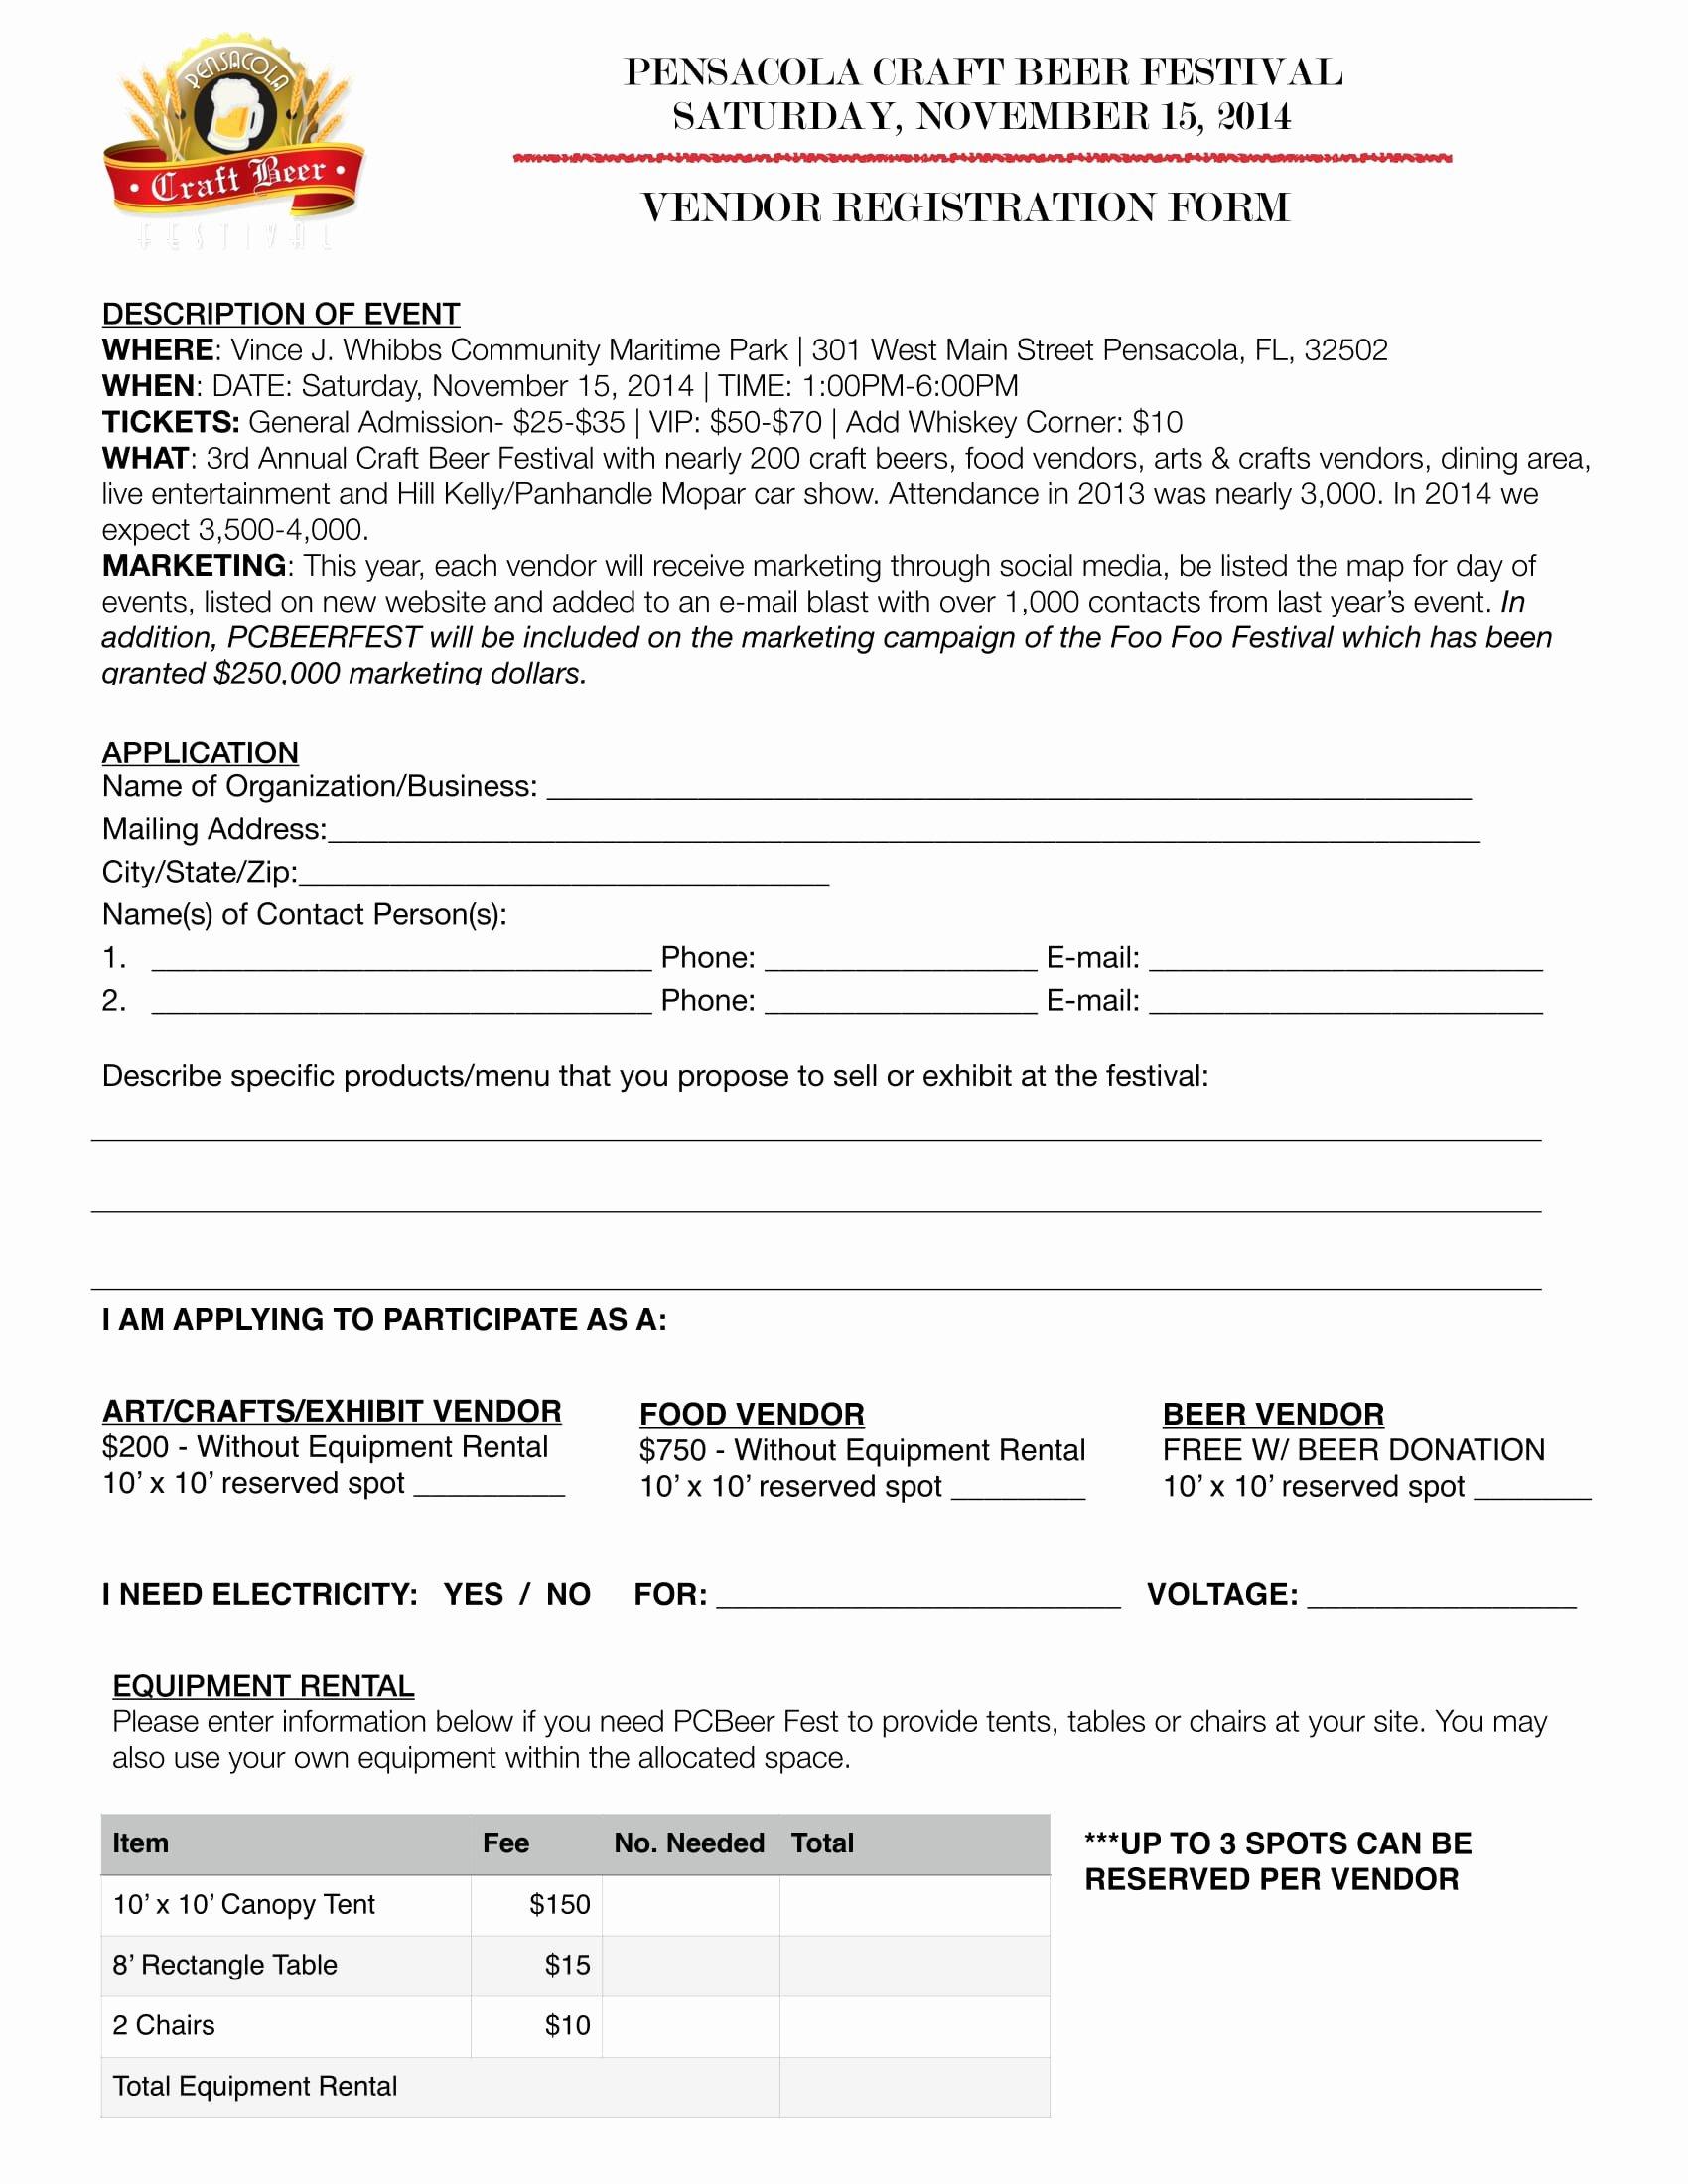 Event Vendor Application Template Inspirational 10 event Vendor Registration form Free Word Pdf Download